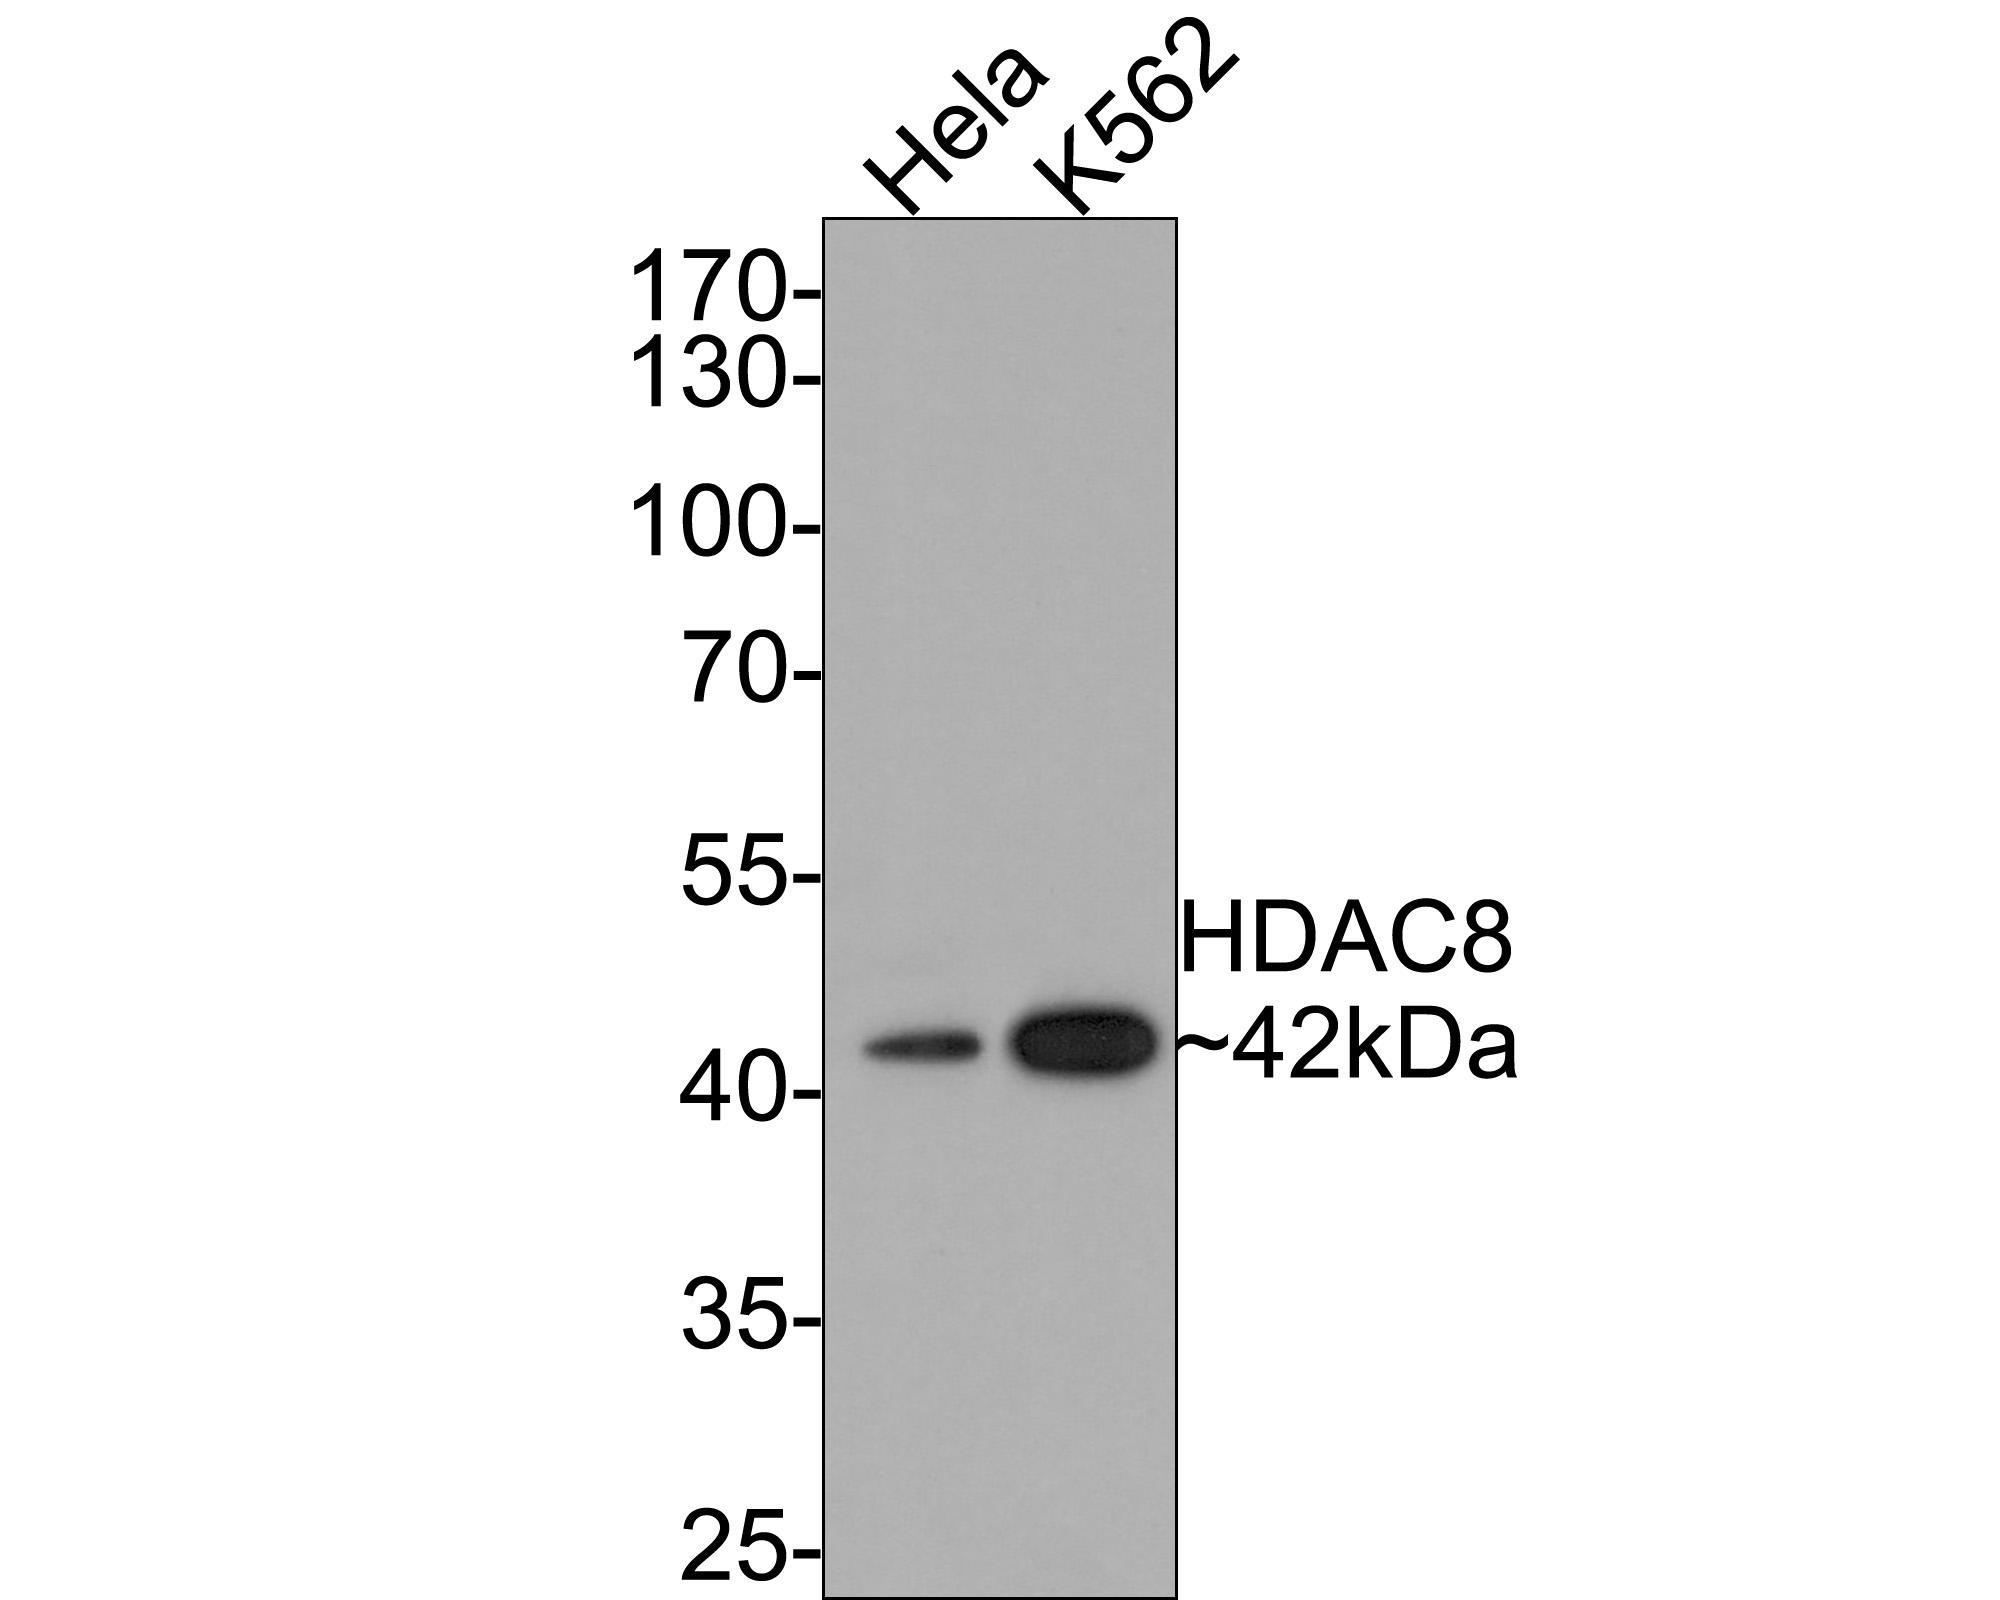 Western blot analysis of HDAC8 on different lysates using anti-HDAC8 antibody at 1/1,000 dilution.<br />  Positive control: <br />  Lane 1: Hela <br />  Lane 2: K562